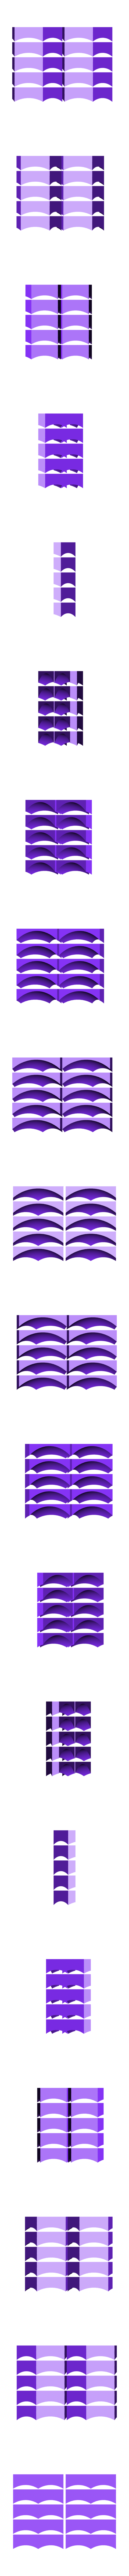 Prusa Reception_Dominik Cisar_Hexagon Tile Half 10x.stl Download free STL file Prusa Reception Tiles - PrusaLab • 3D print model, cisardom